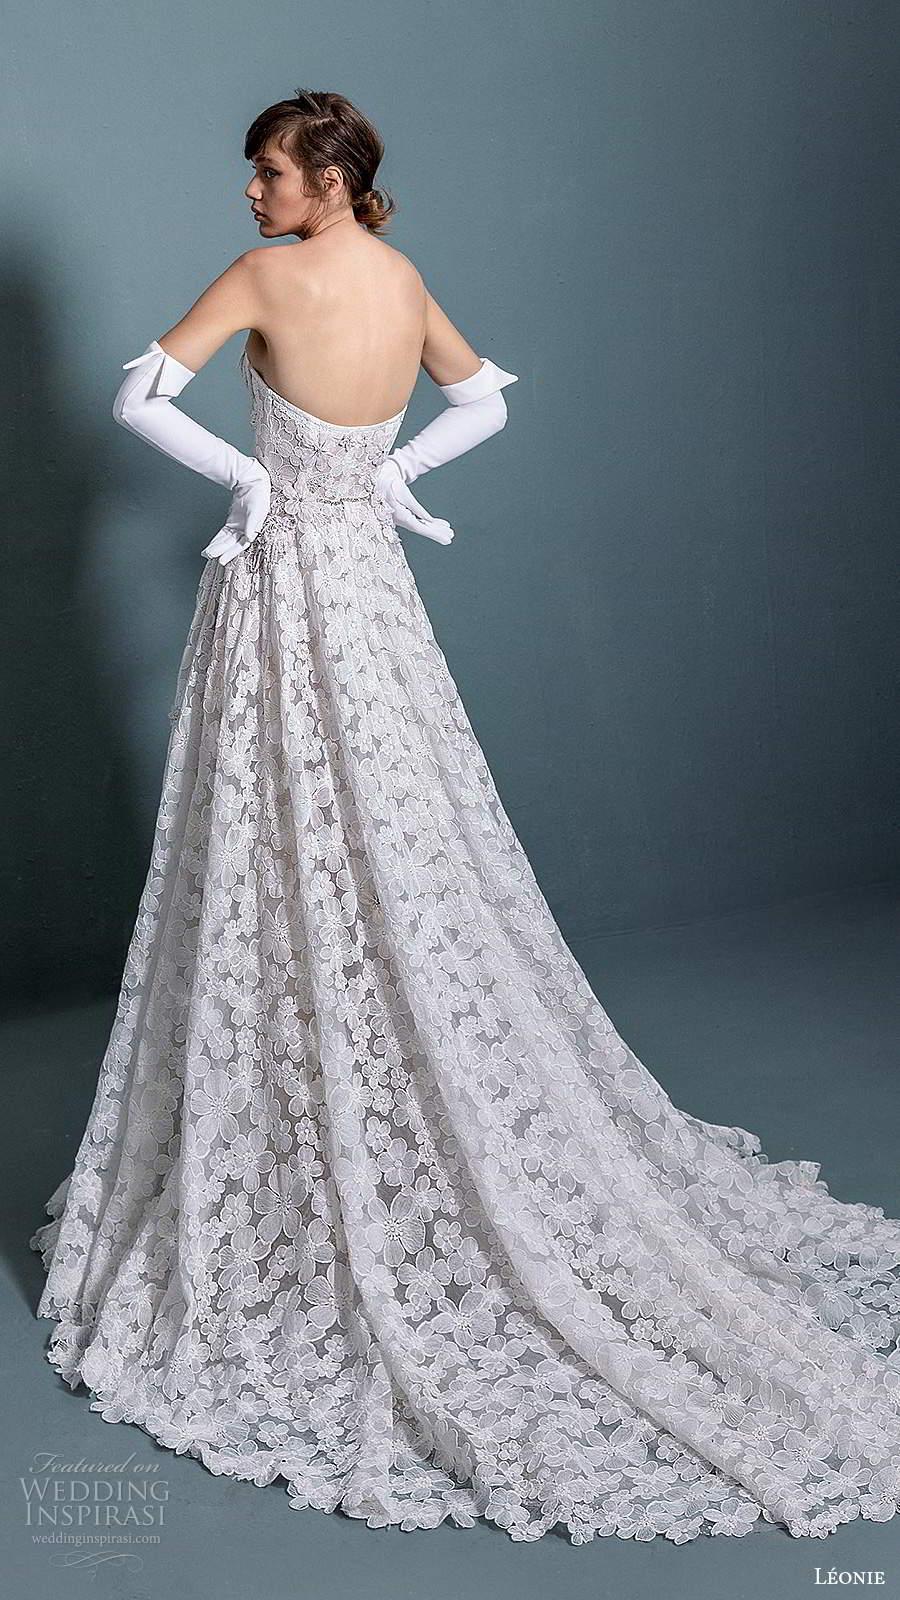 leonie bridal 2020 bridal strapless semi sweetheart neckline fully embellished a line ball gown wedding dress chapel train (2) bv